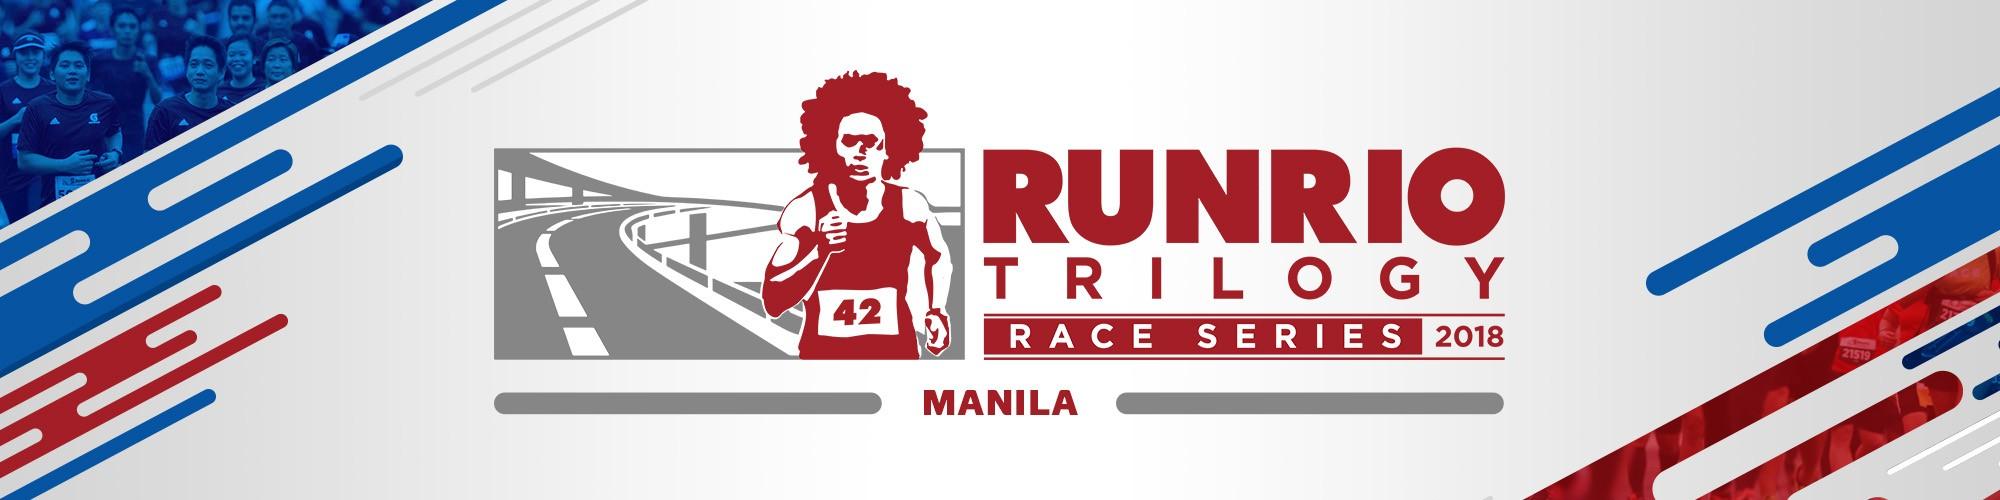 RUNRIO Trilogy Manila Leg 1